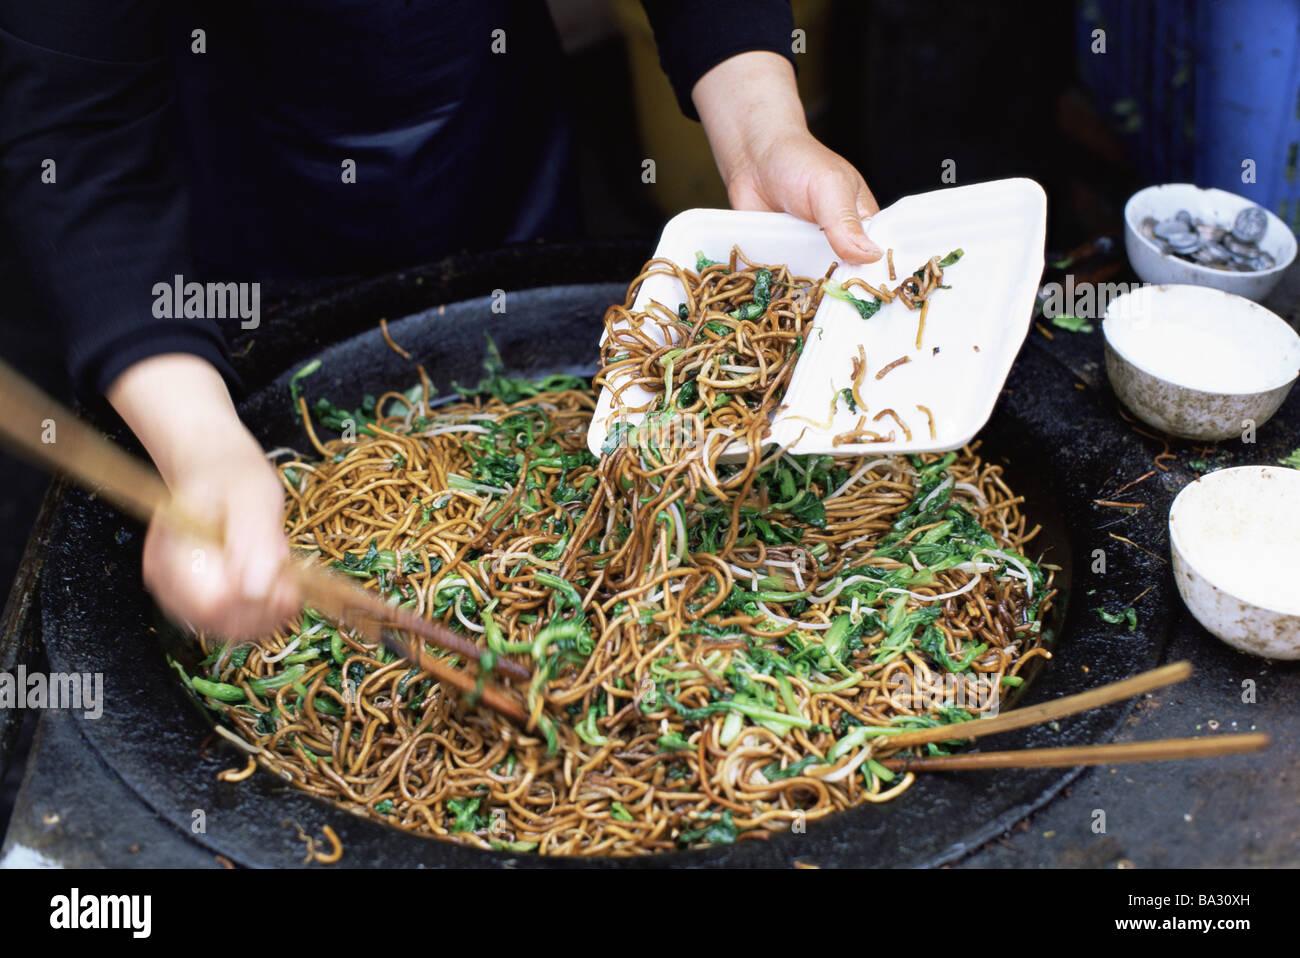 china shanghai garküche detail wok noodle-court person hands peel